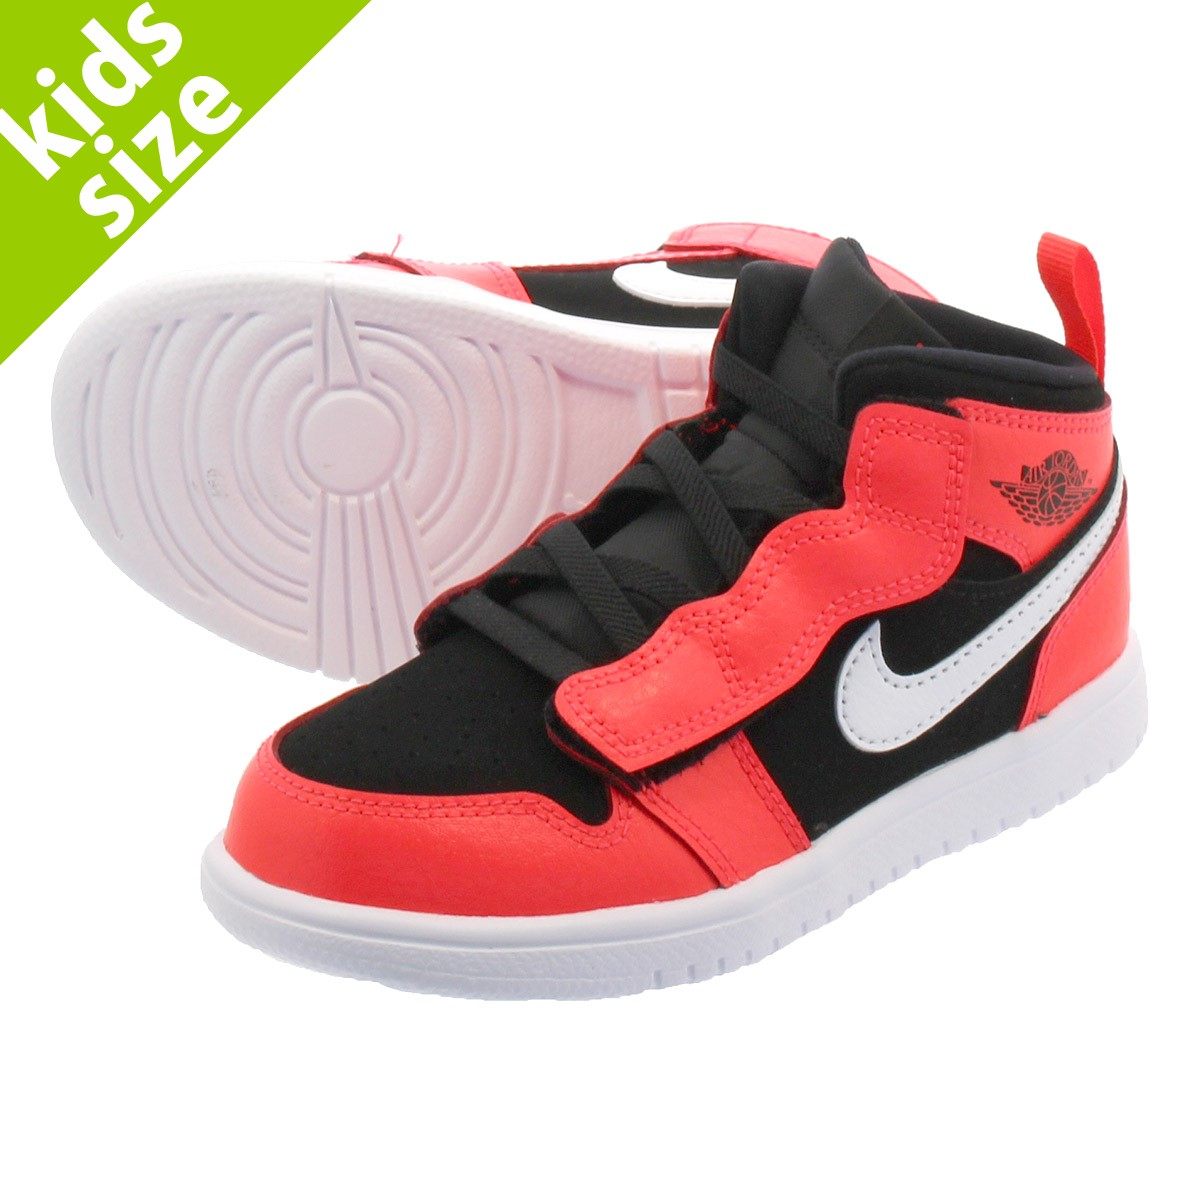 buy online ce212 be4f5 NIKE AIR JORDAN 1 MID ALT TD Nike Air Jordan 1 mid ALT TD BLACK  ...